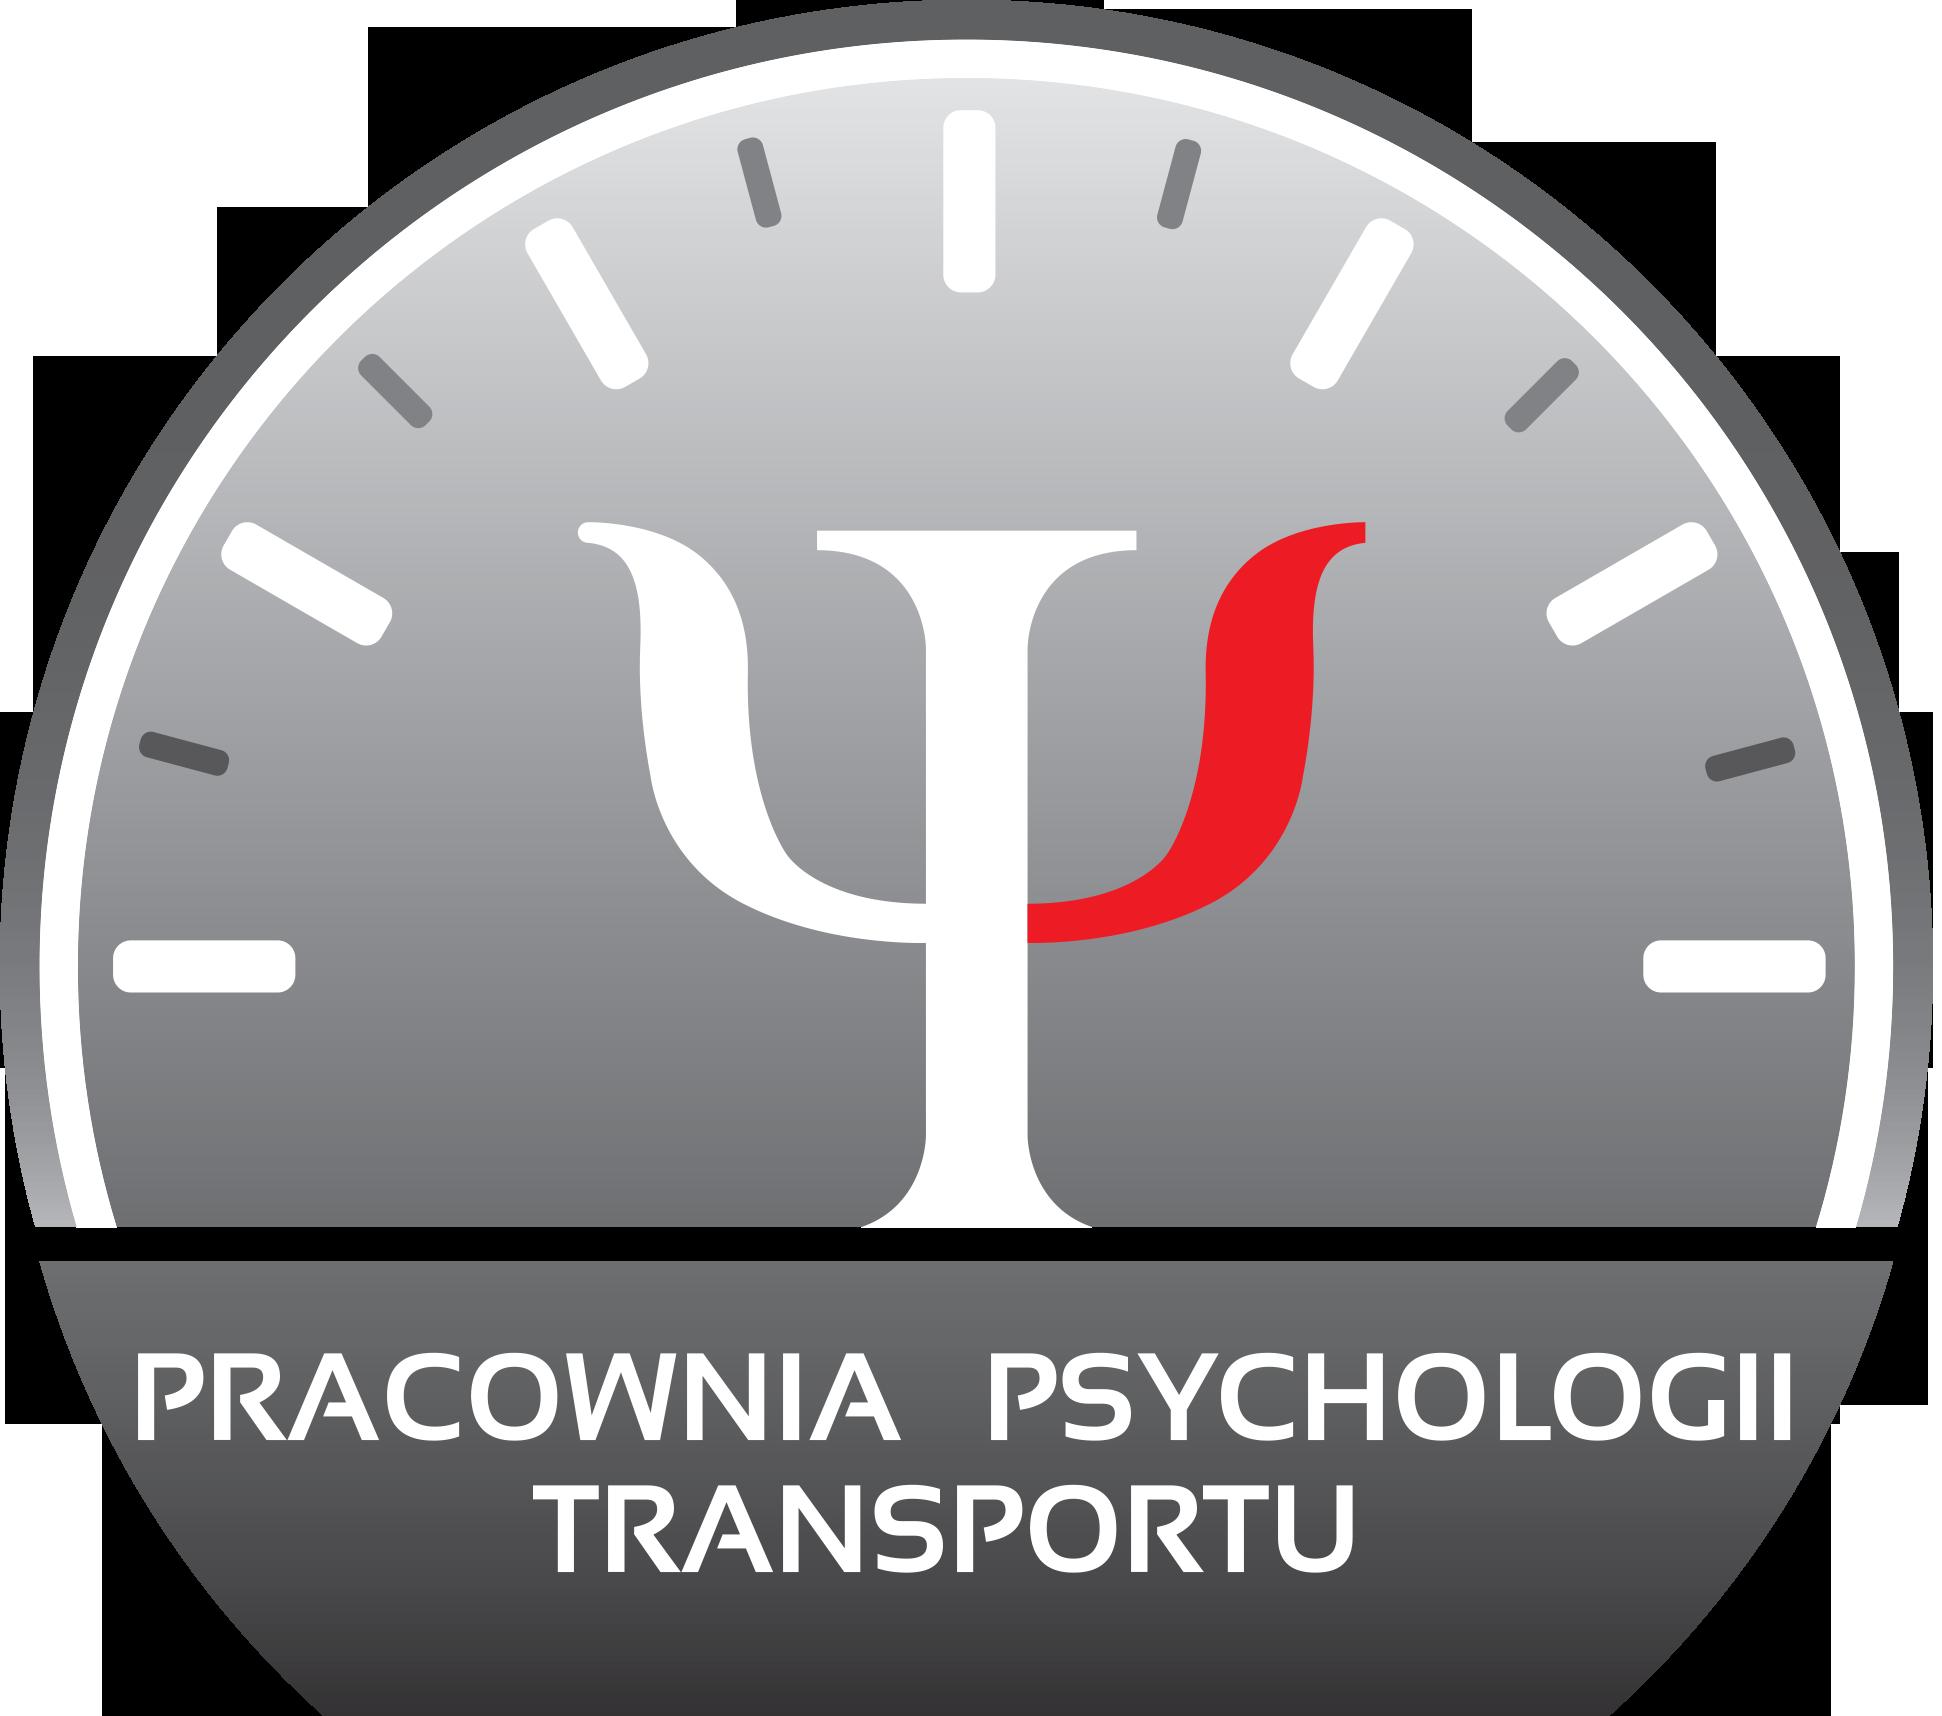 Pracownia Psychologii Transportu